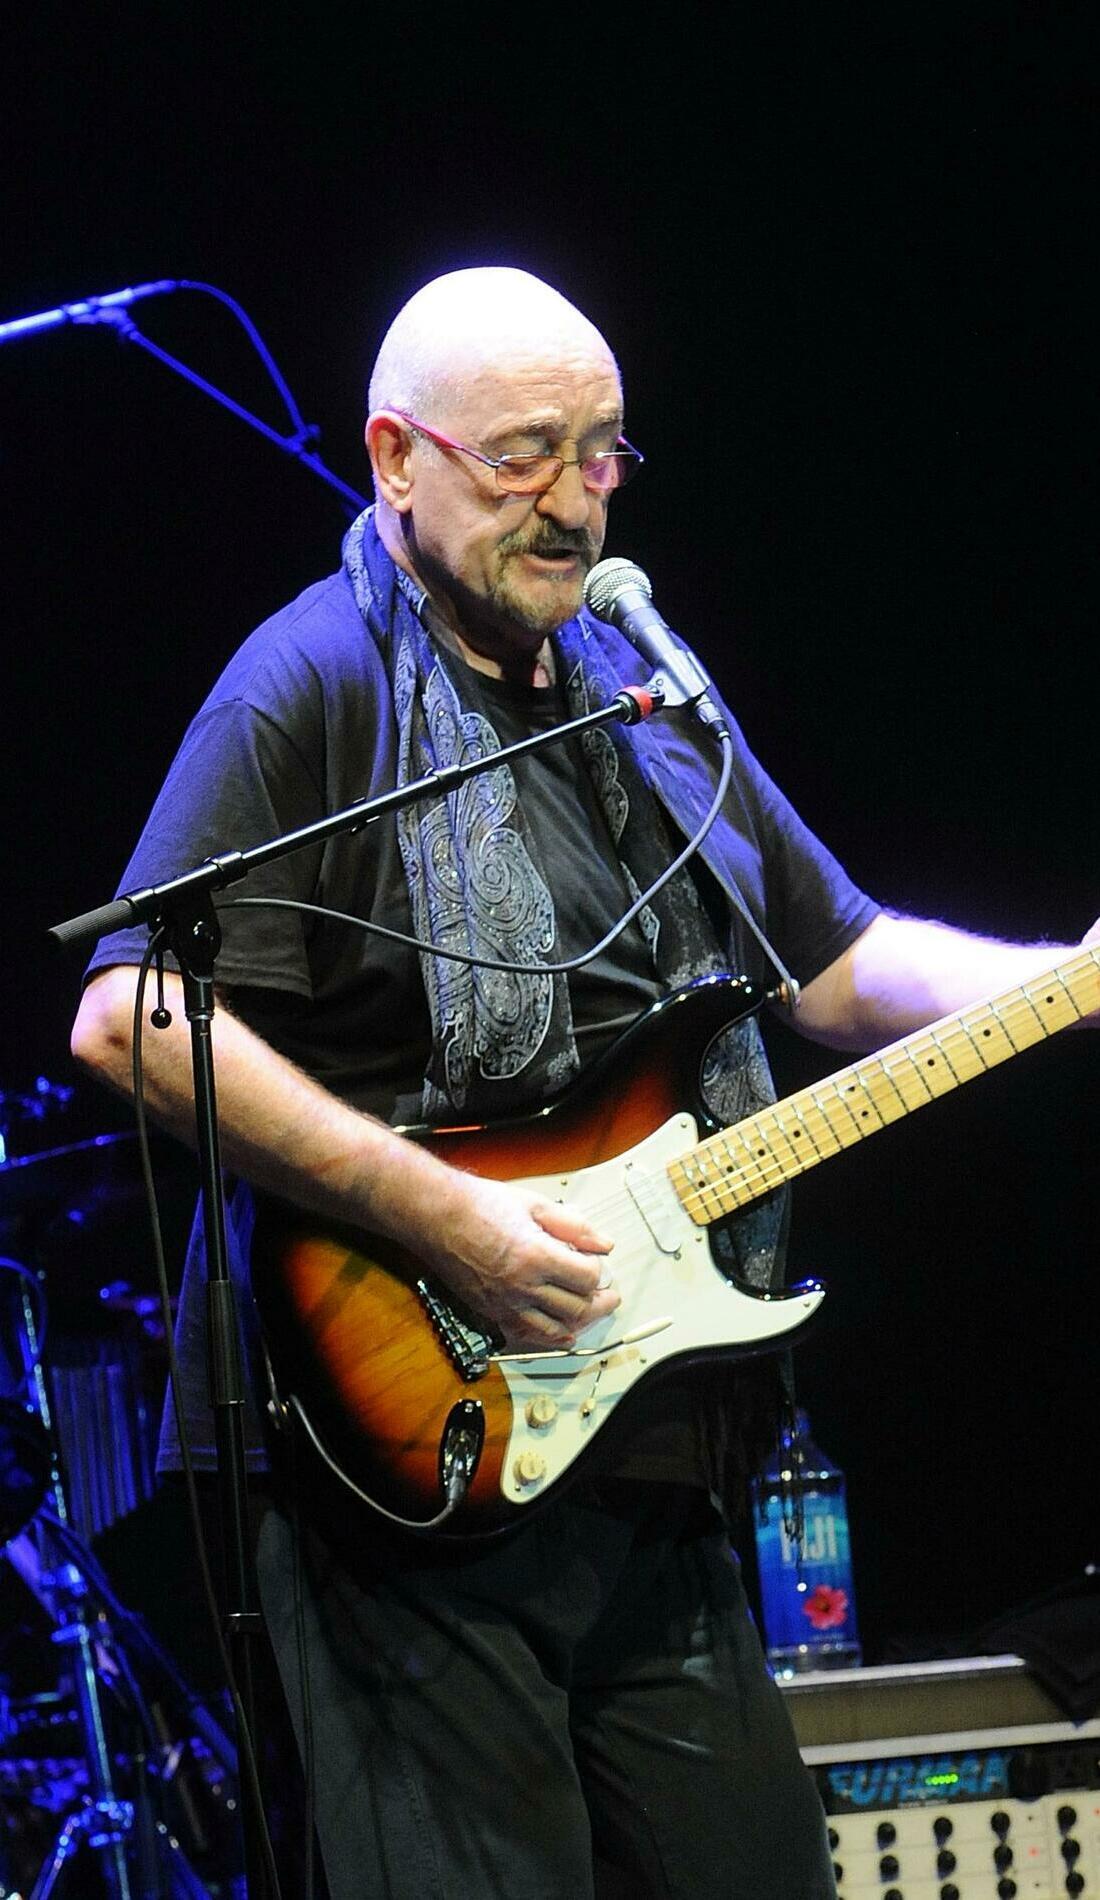 A Dave Mason live event